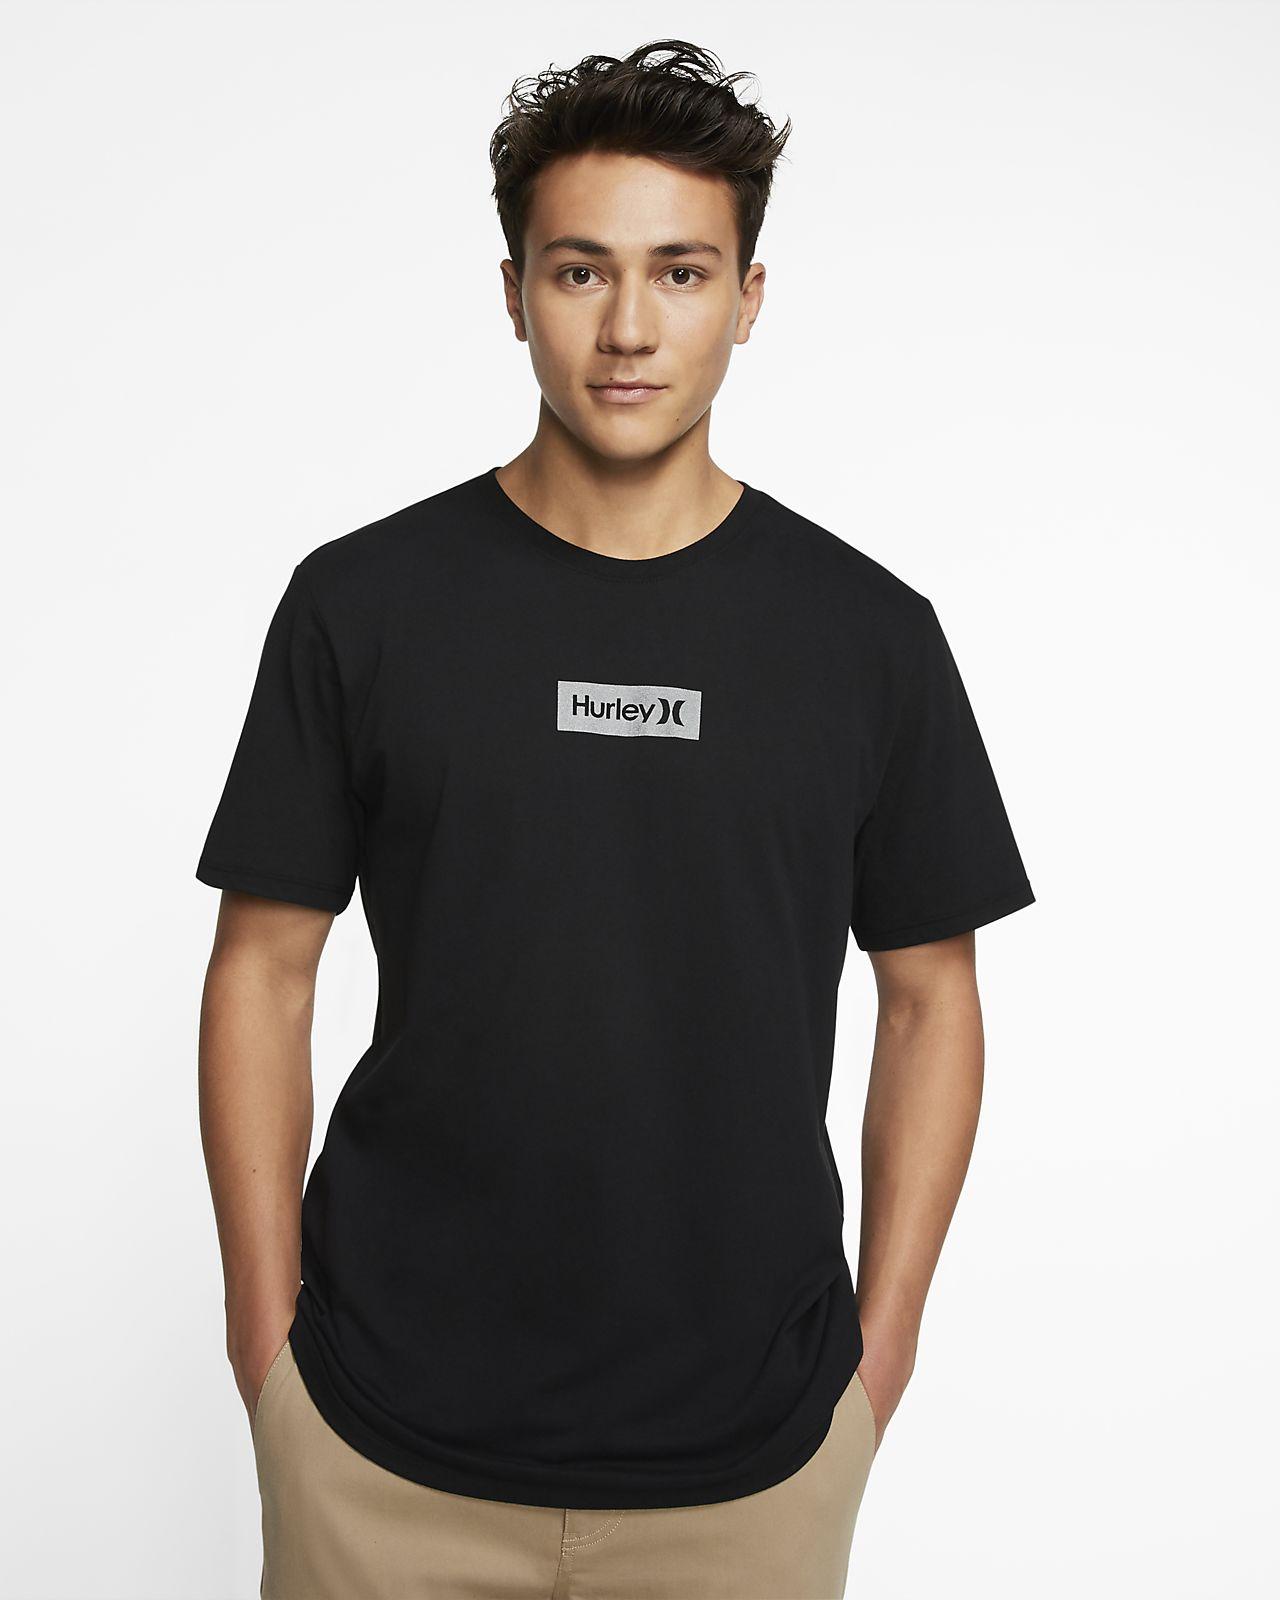 Hurley Dri-FIT One And Only Small Box Erkek Tişörtü